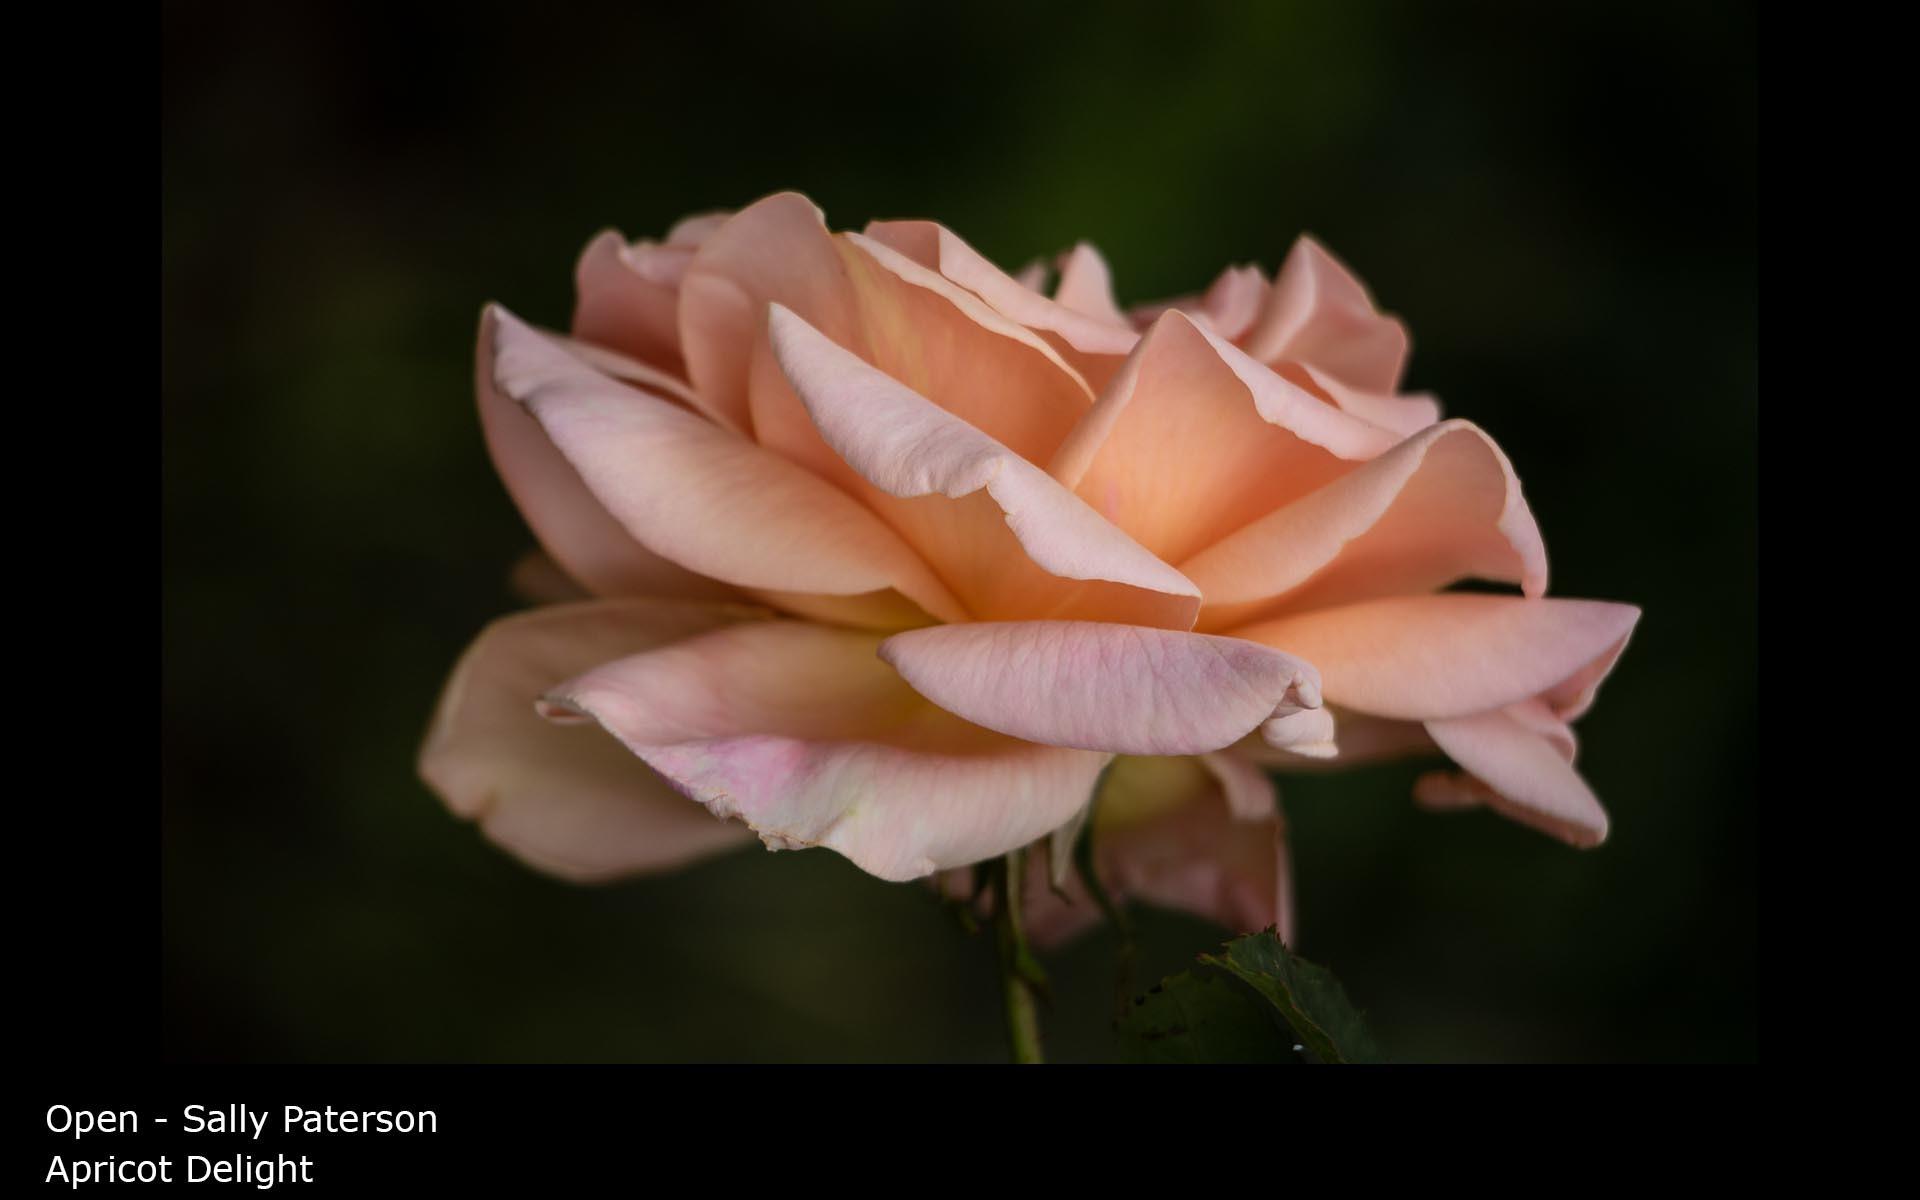 Apricot Delight - Sally Paterson